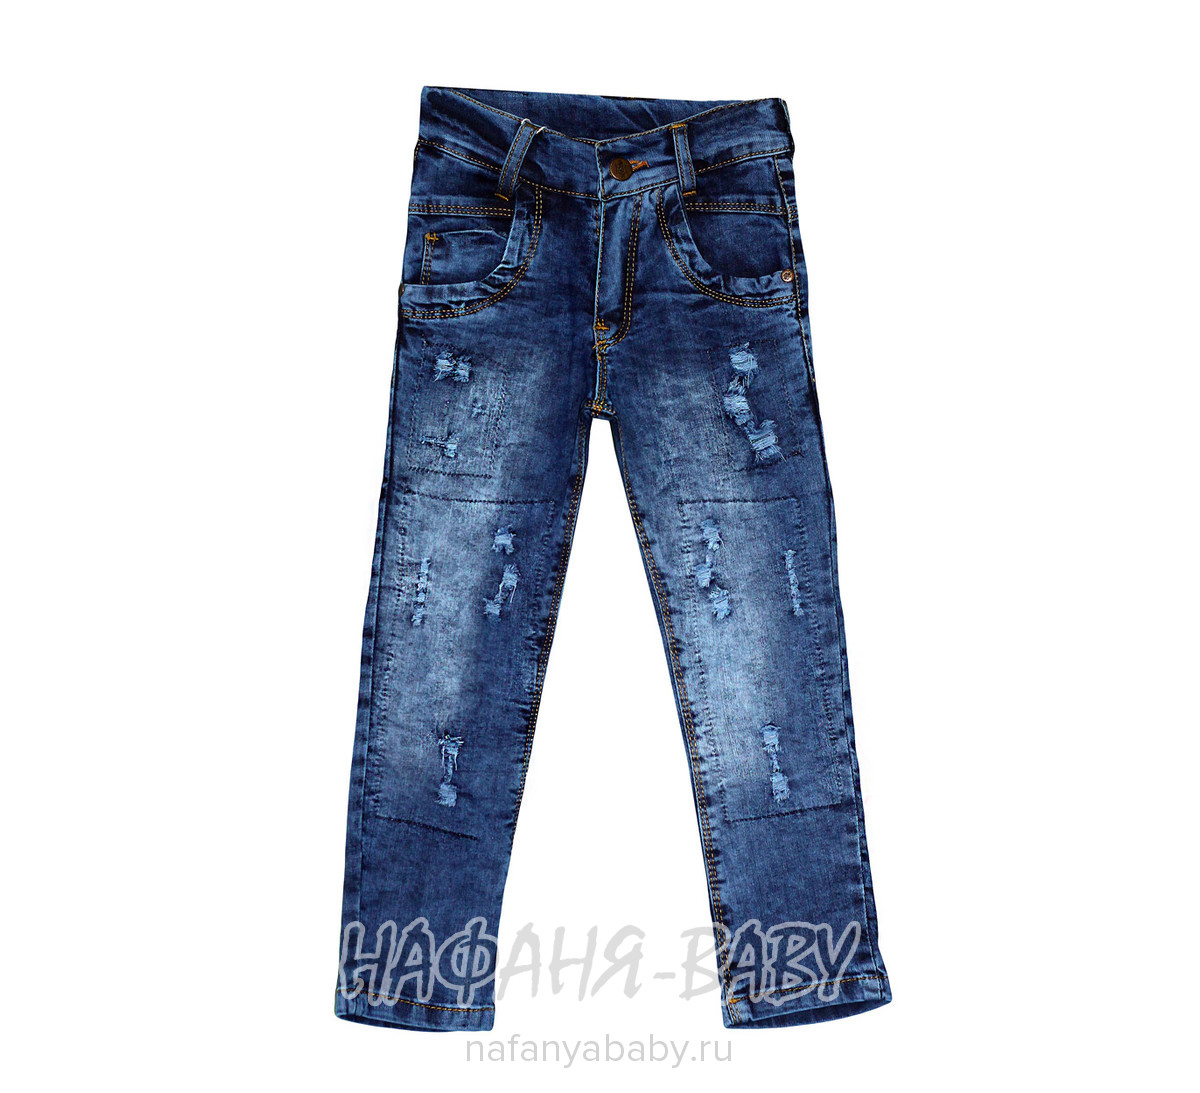 Детские джинсы, артикул 18253 SERCINO арт: 18253, цвет темно-синий, оптом Турция